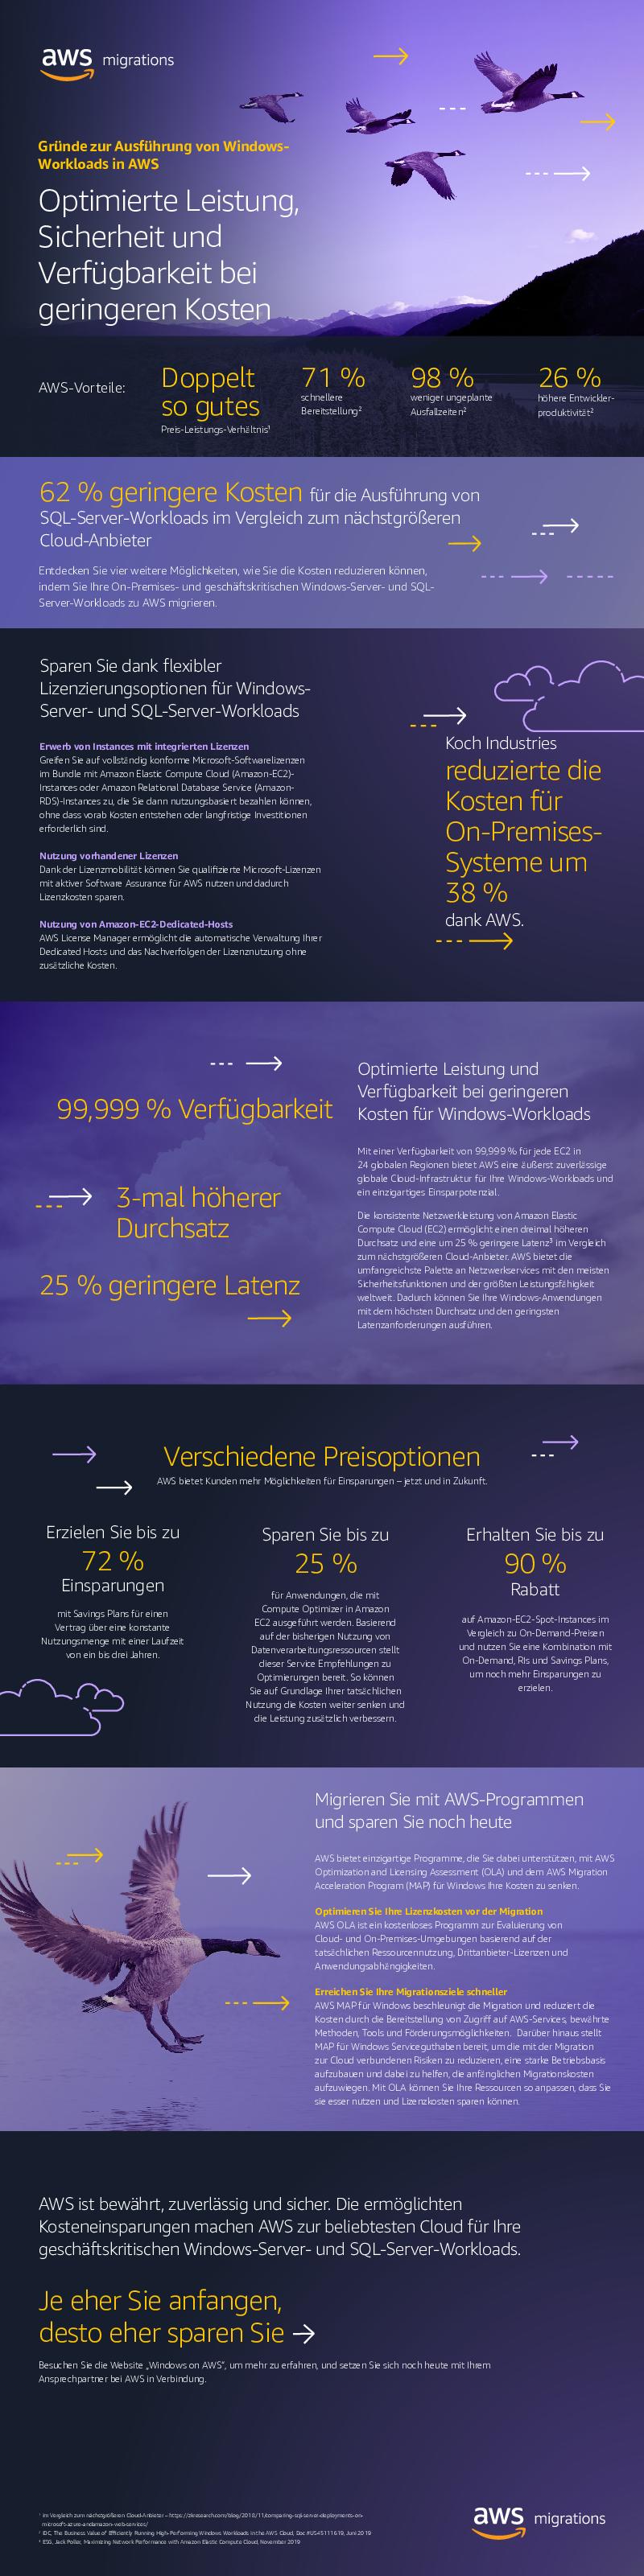 Square cropped thumb original cost savings infographic de de b5c9f8eb48597f16